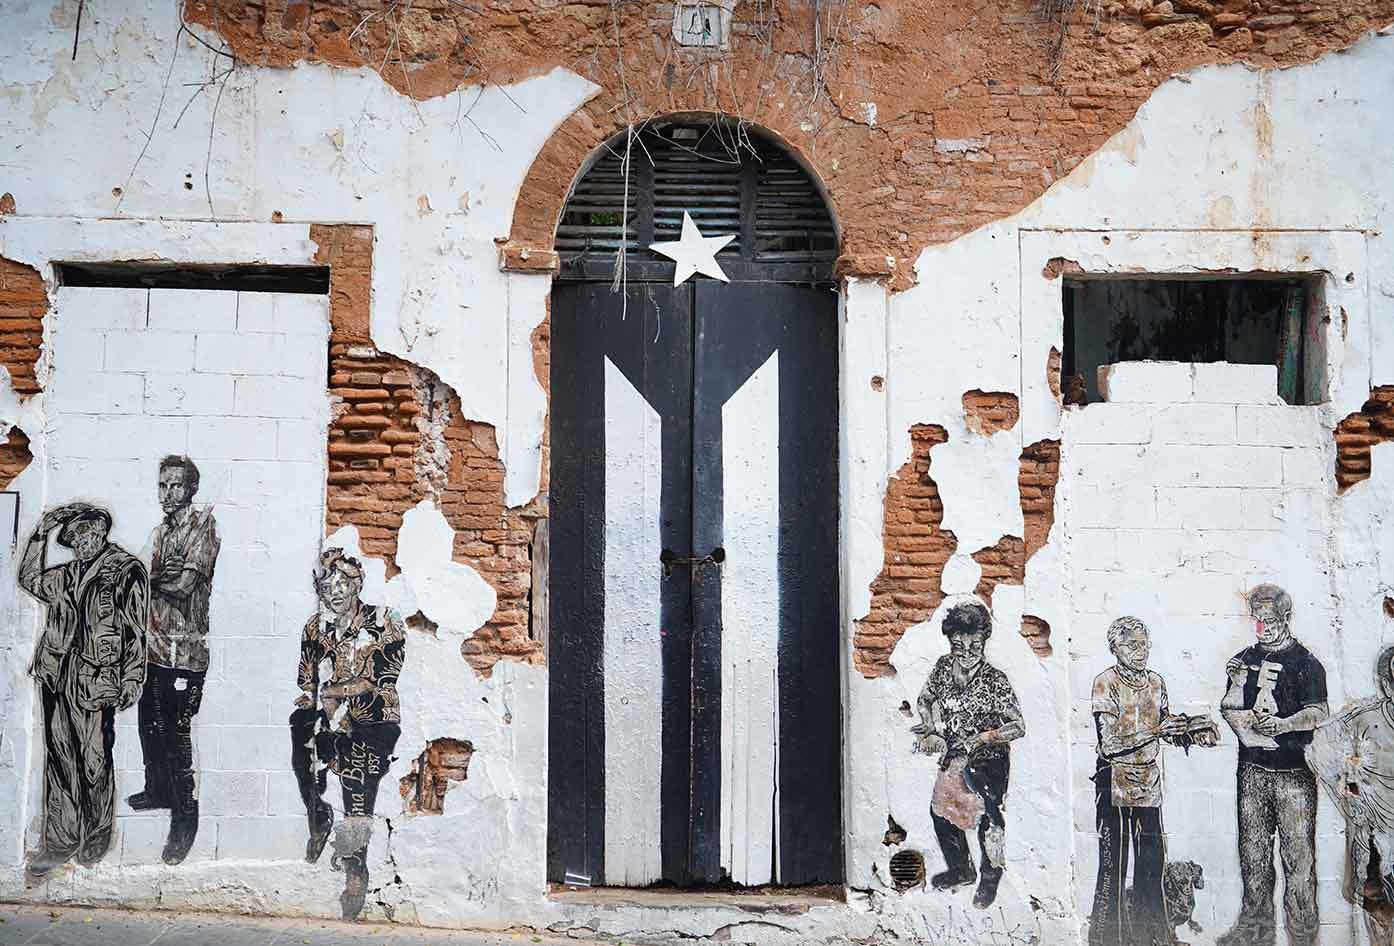 la puerta de la bandera